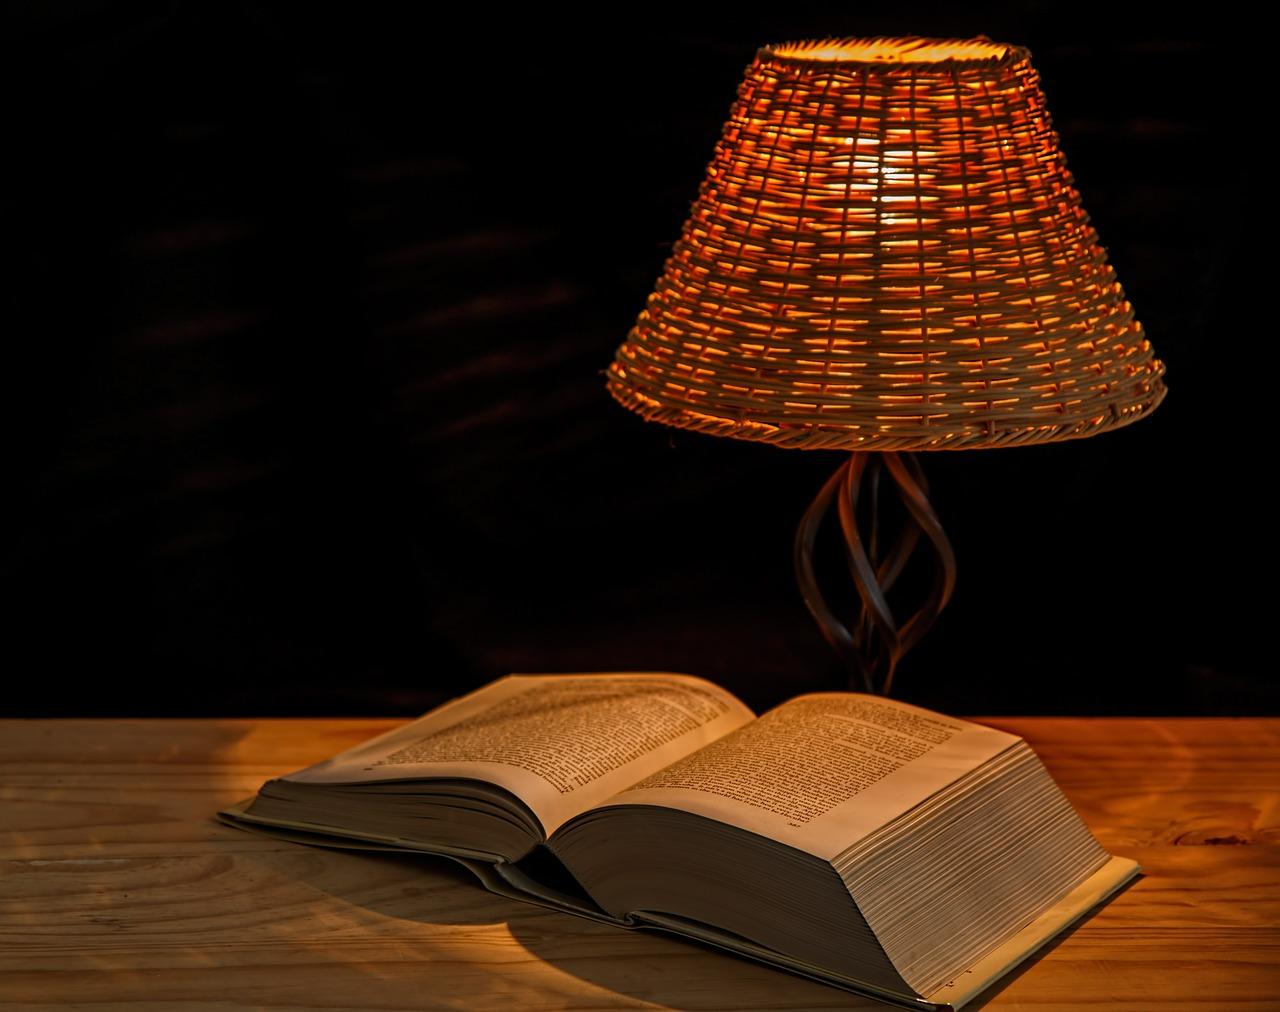 Wnętrze w stylu vintage. Dodatki do domu vintage – lampy stylowe